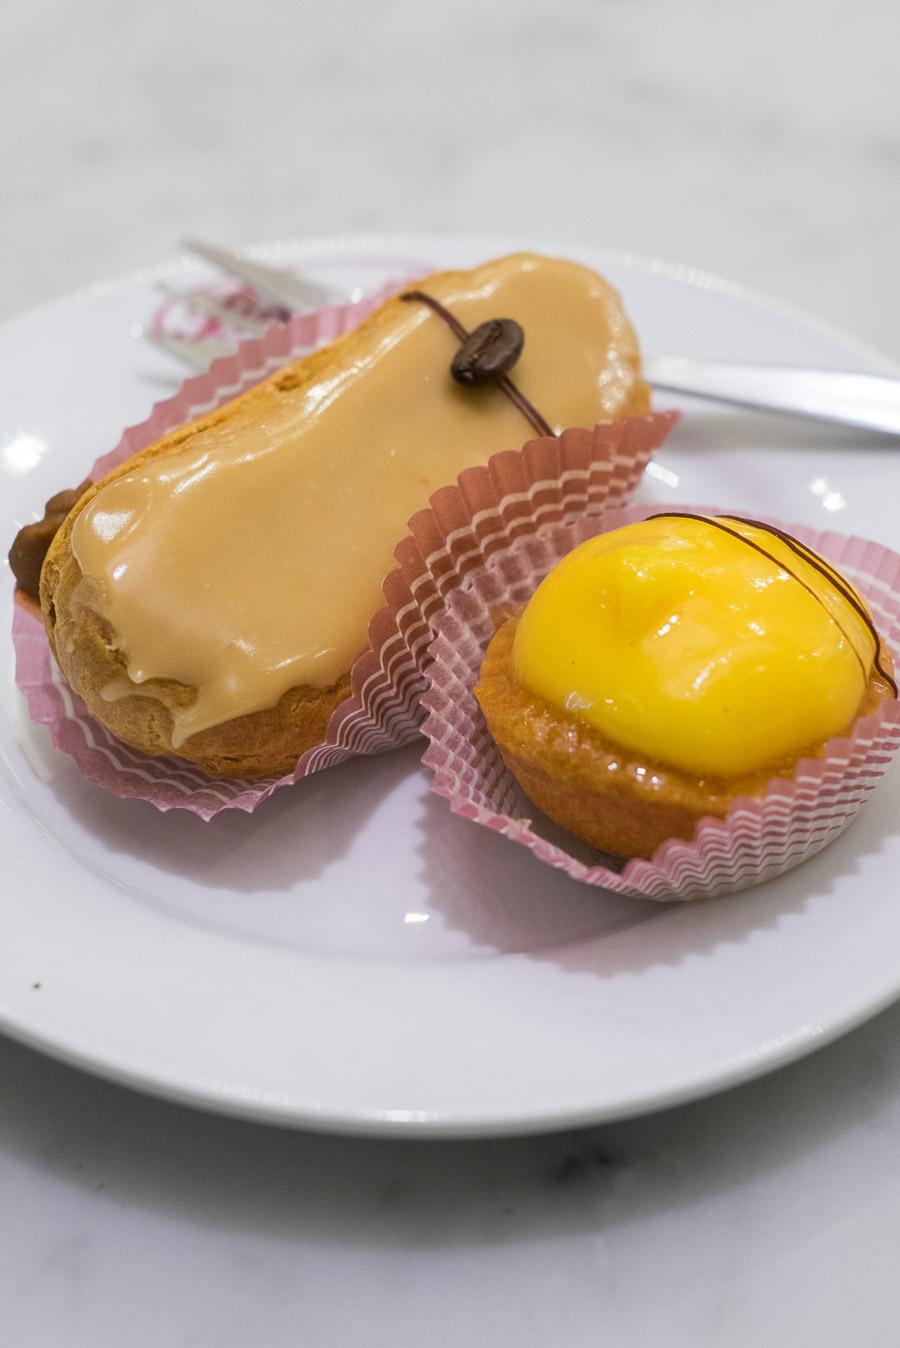 Coffee eclair and lemon tart, Brunetti